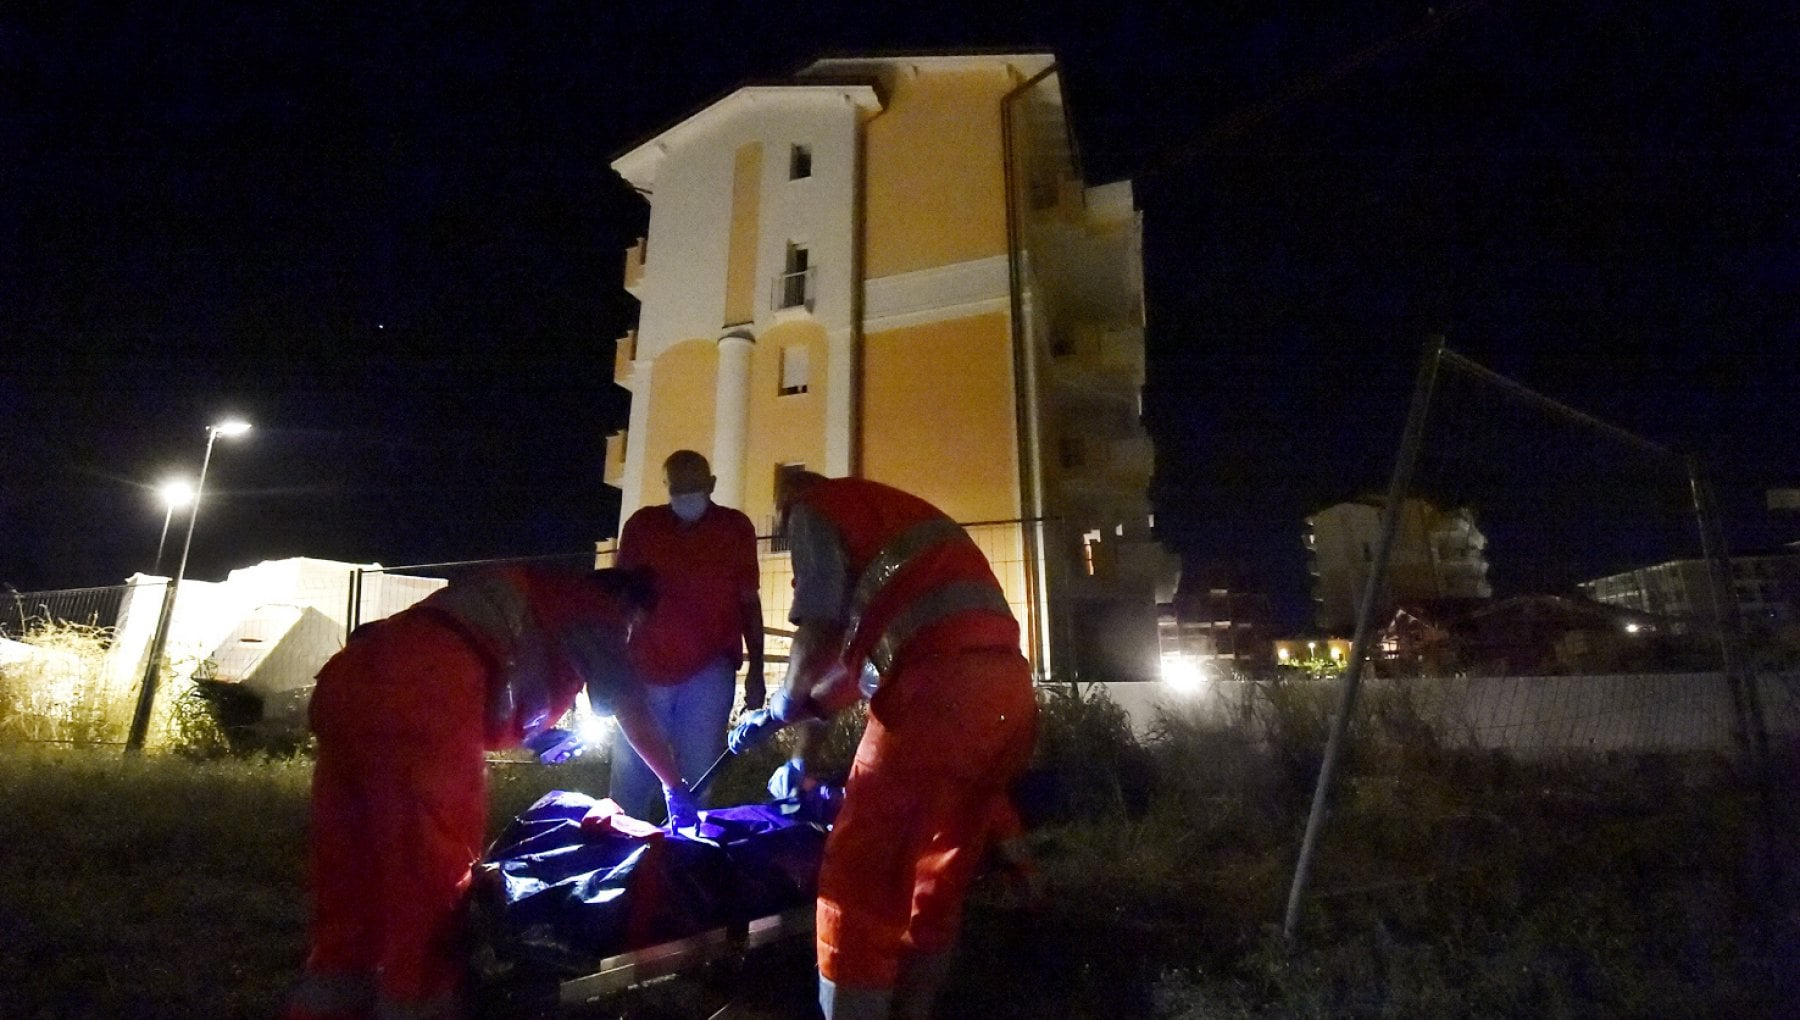 100448205 defc4a3d 1b72 4ce9 9a7d de810f8b5ef3 - Parma, cadavere di un uomo in un cantiere: indaga la polizia